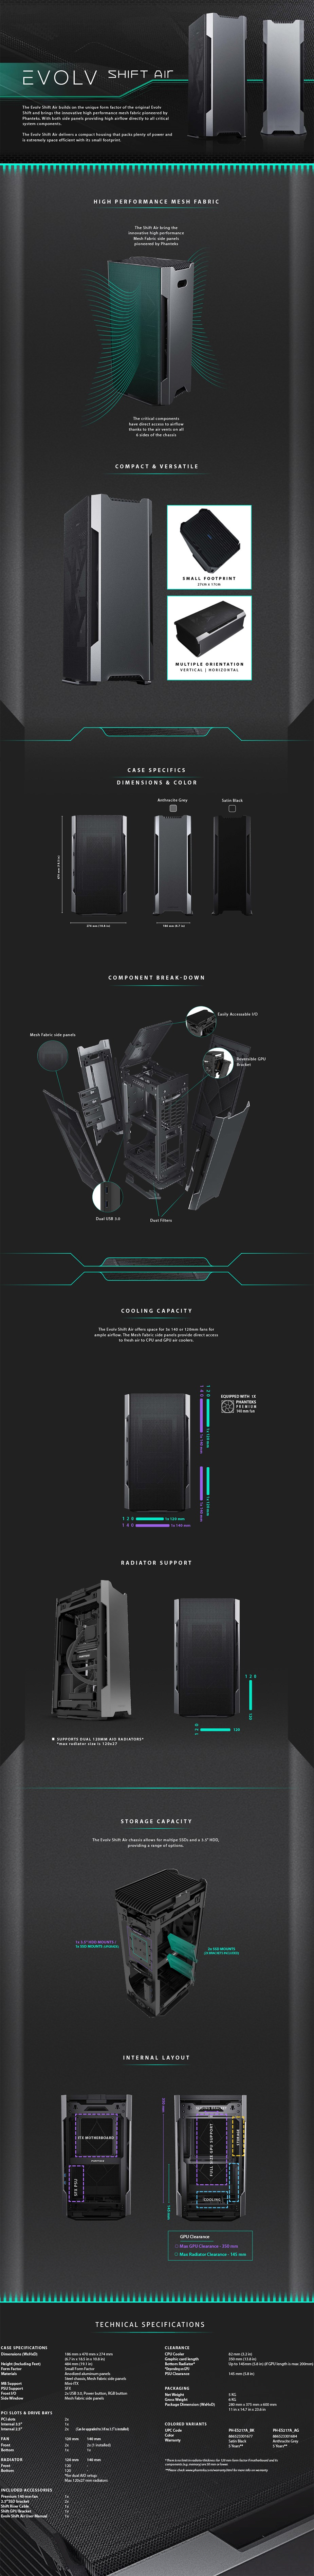 Phanteks Enthoo Evolv Shift Air Mini-ITX Case - Anthracite Gray - Overview 1